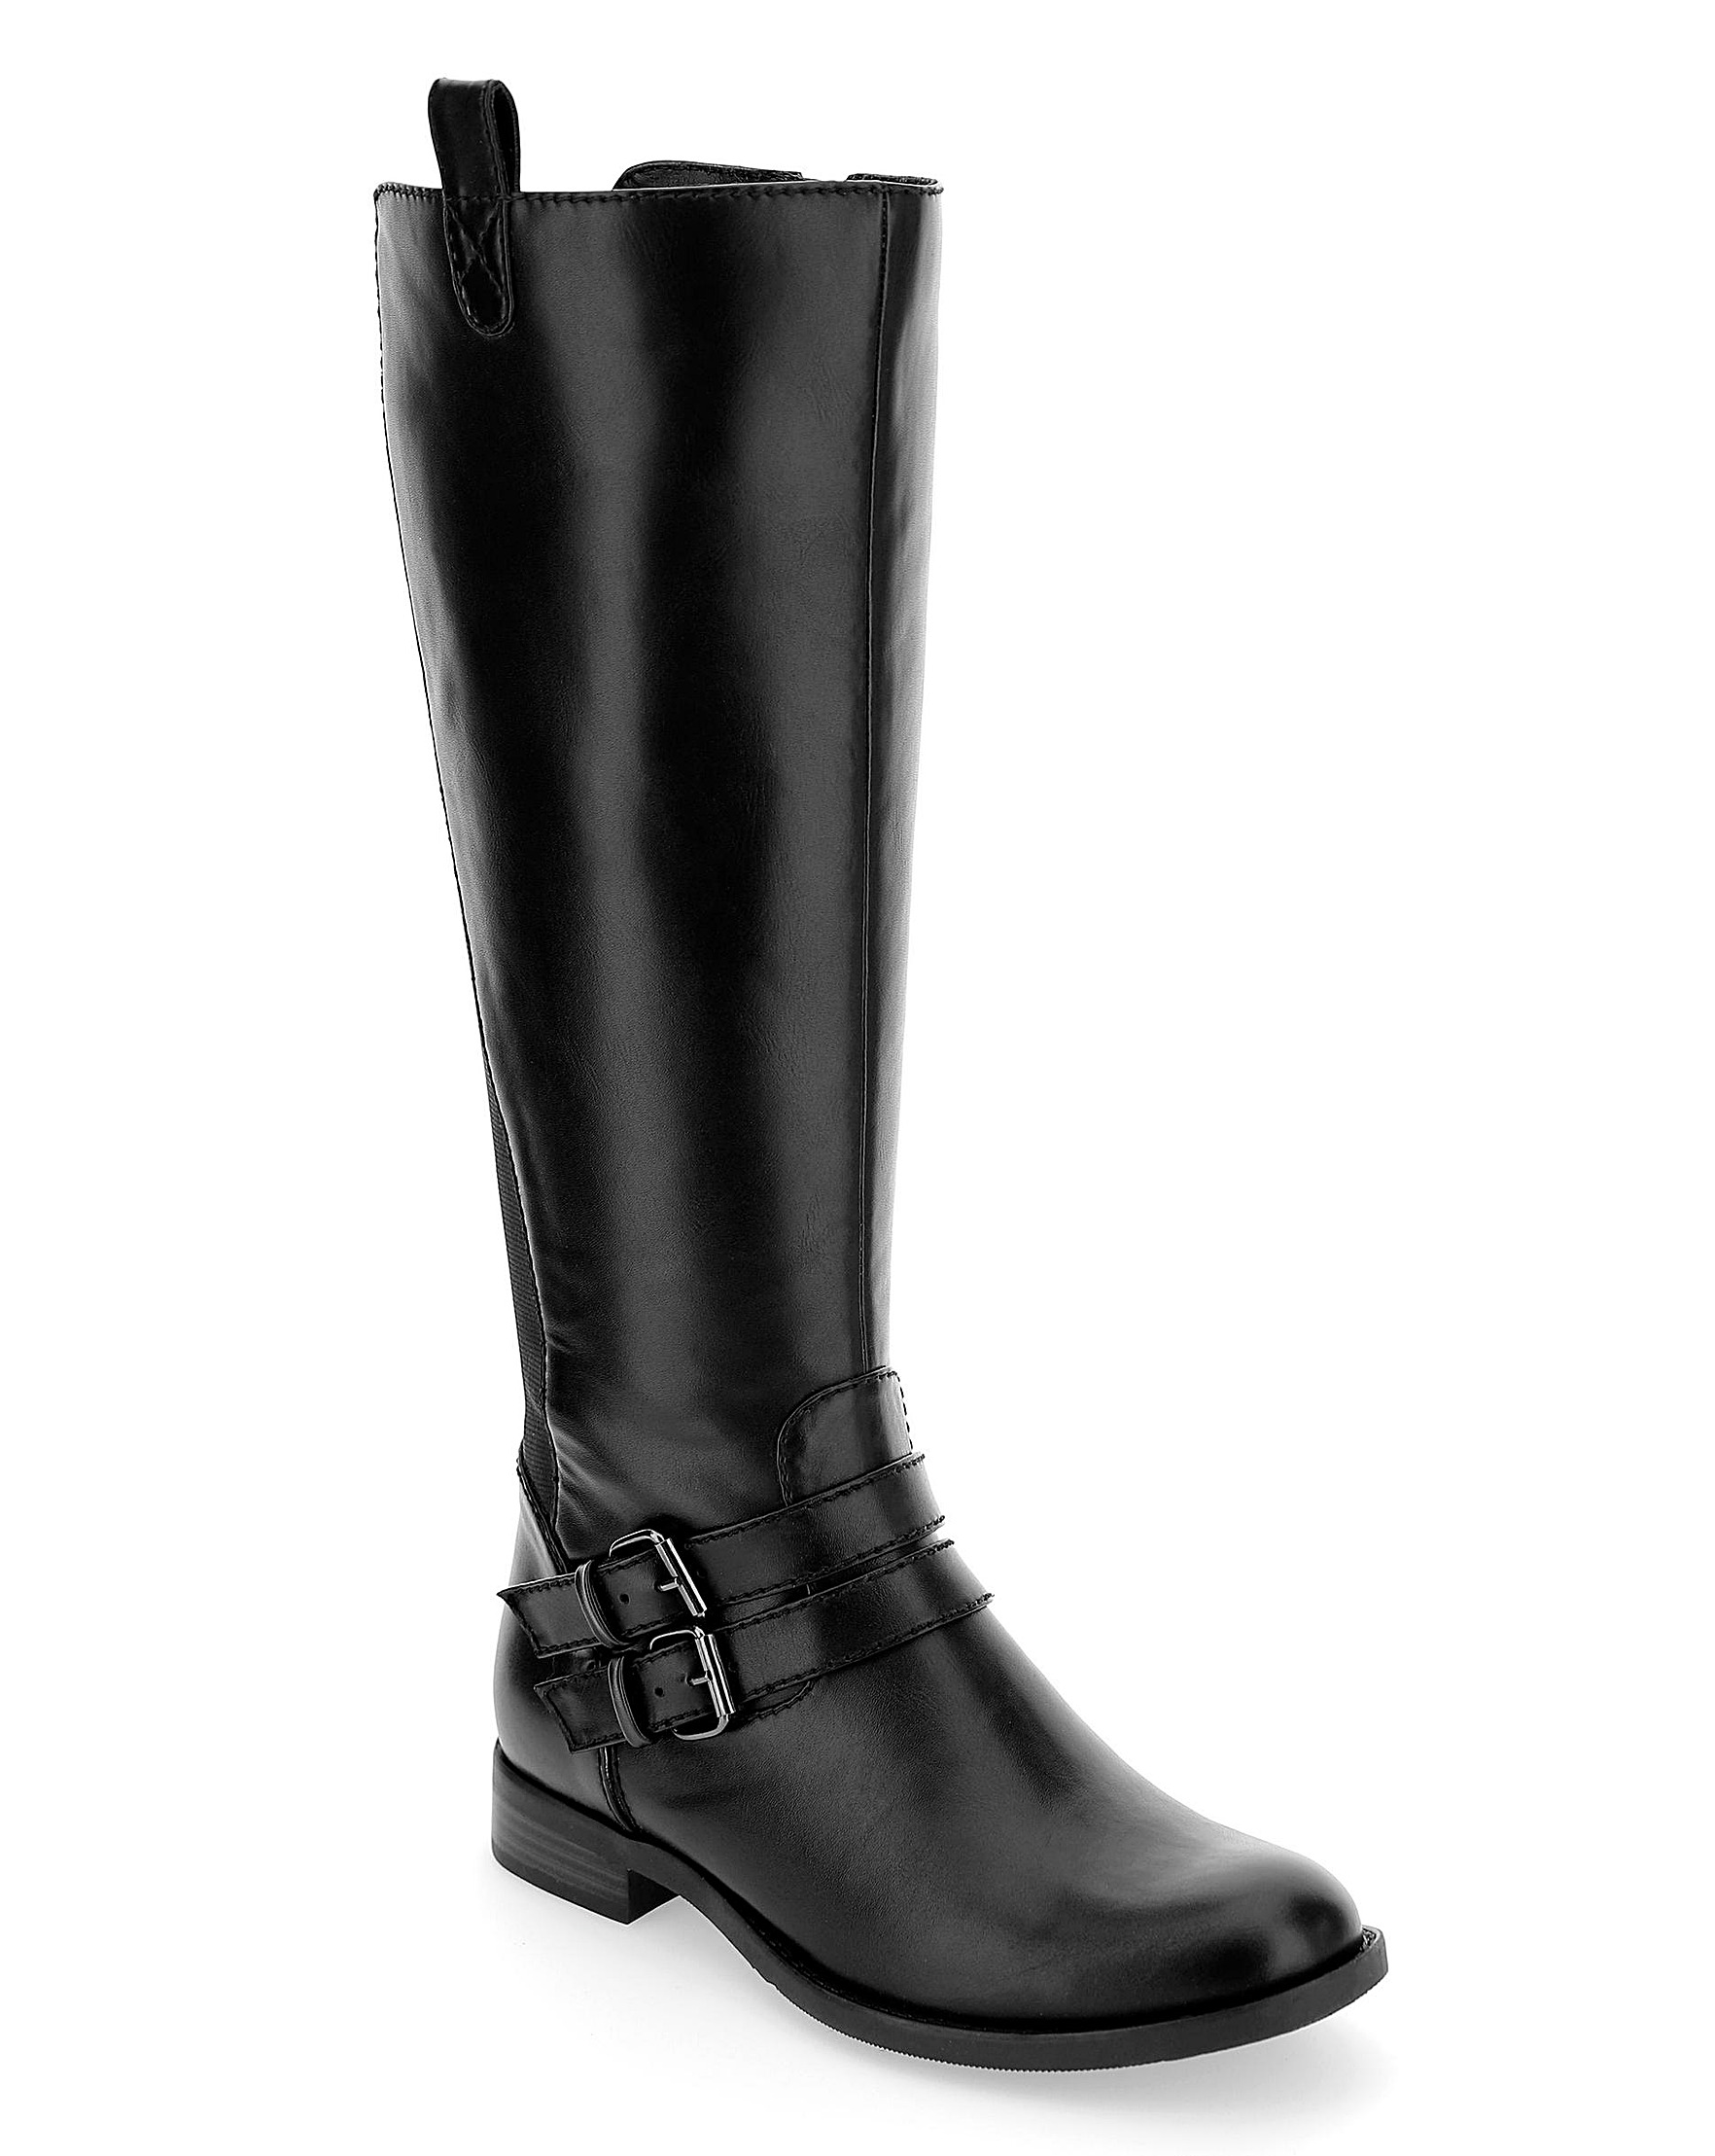 new york 42dea c5f4a Elastic Back Boots EEEEE Ex Curvy Plus